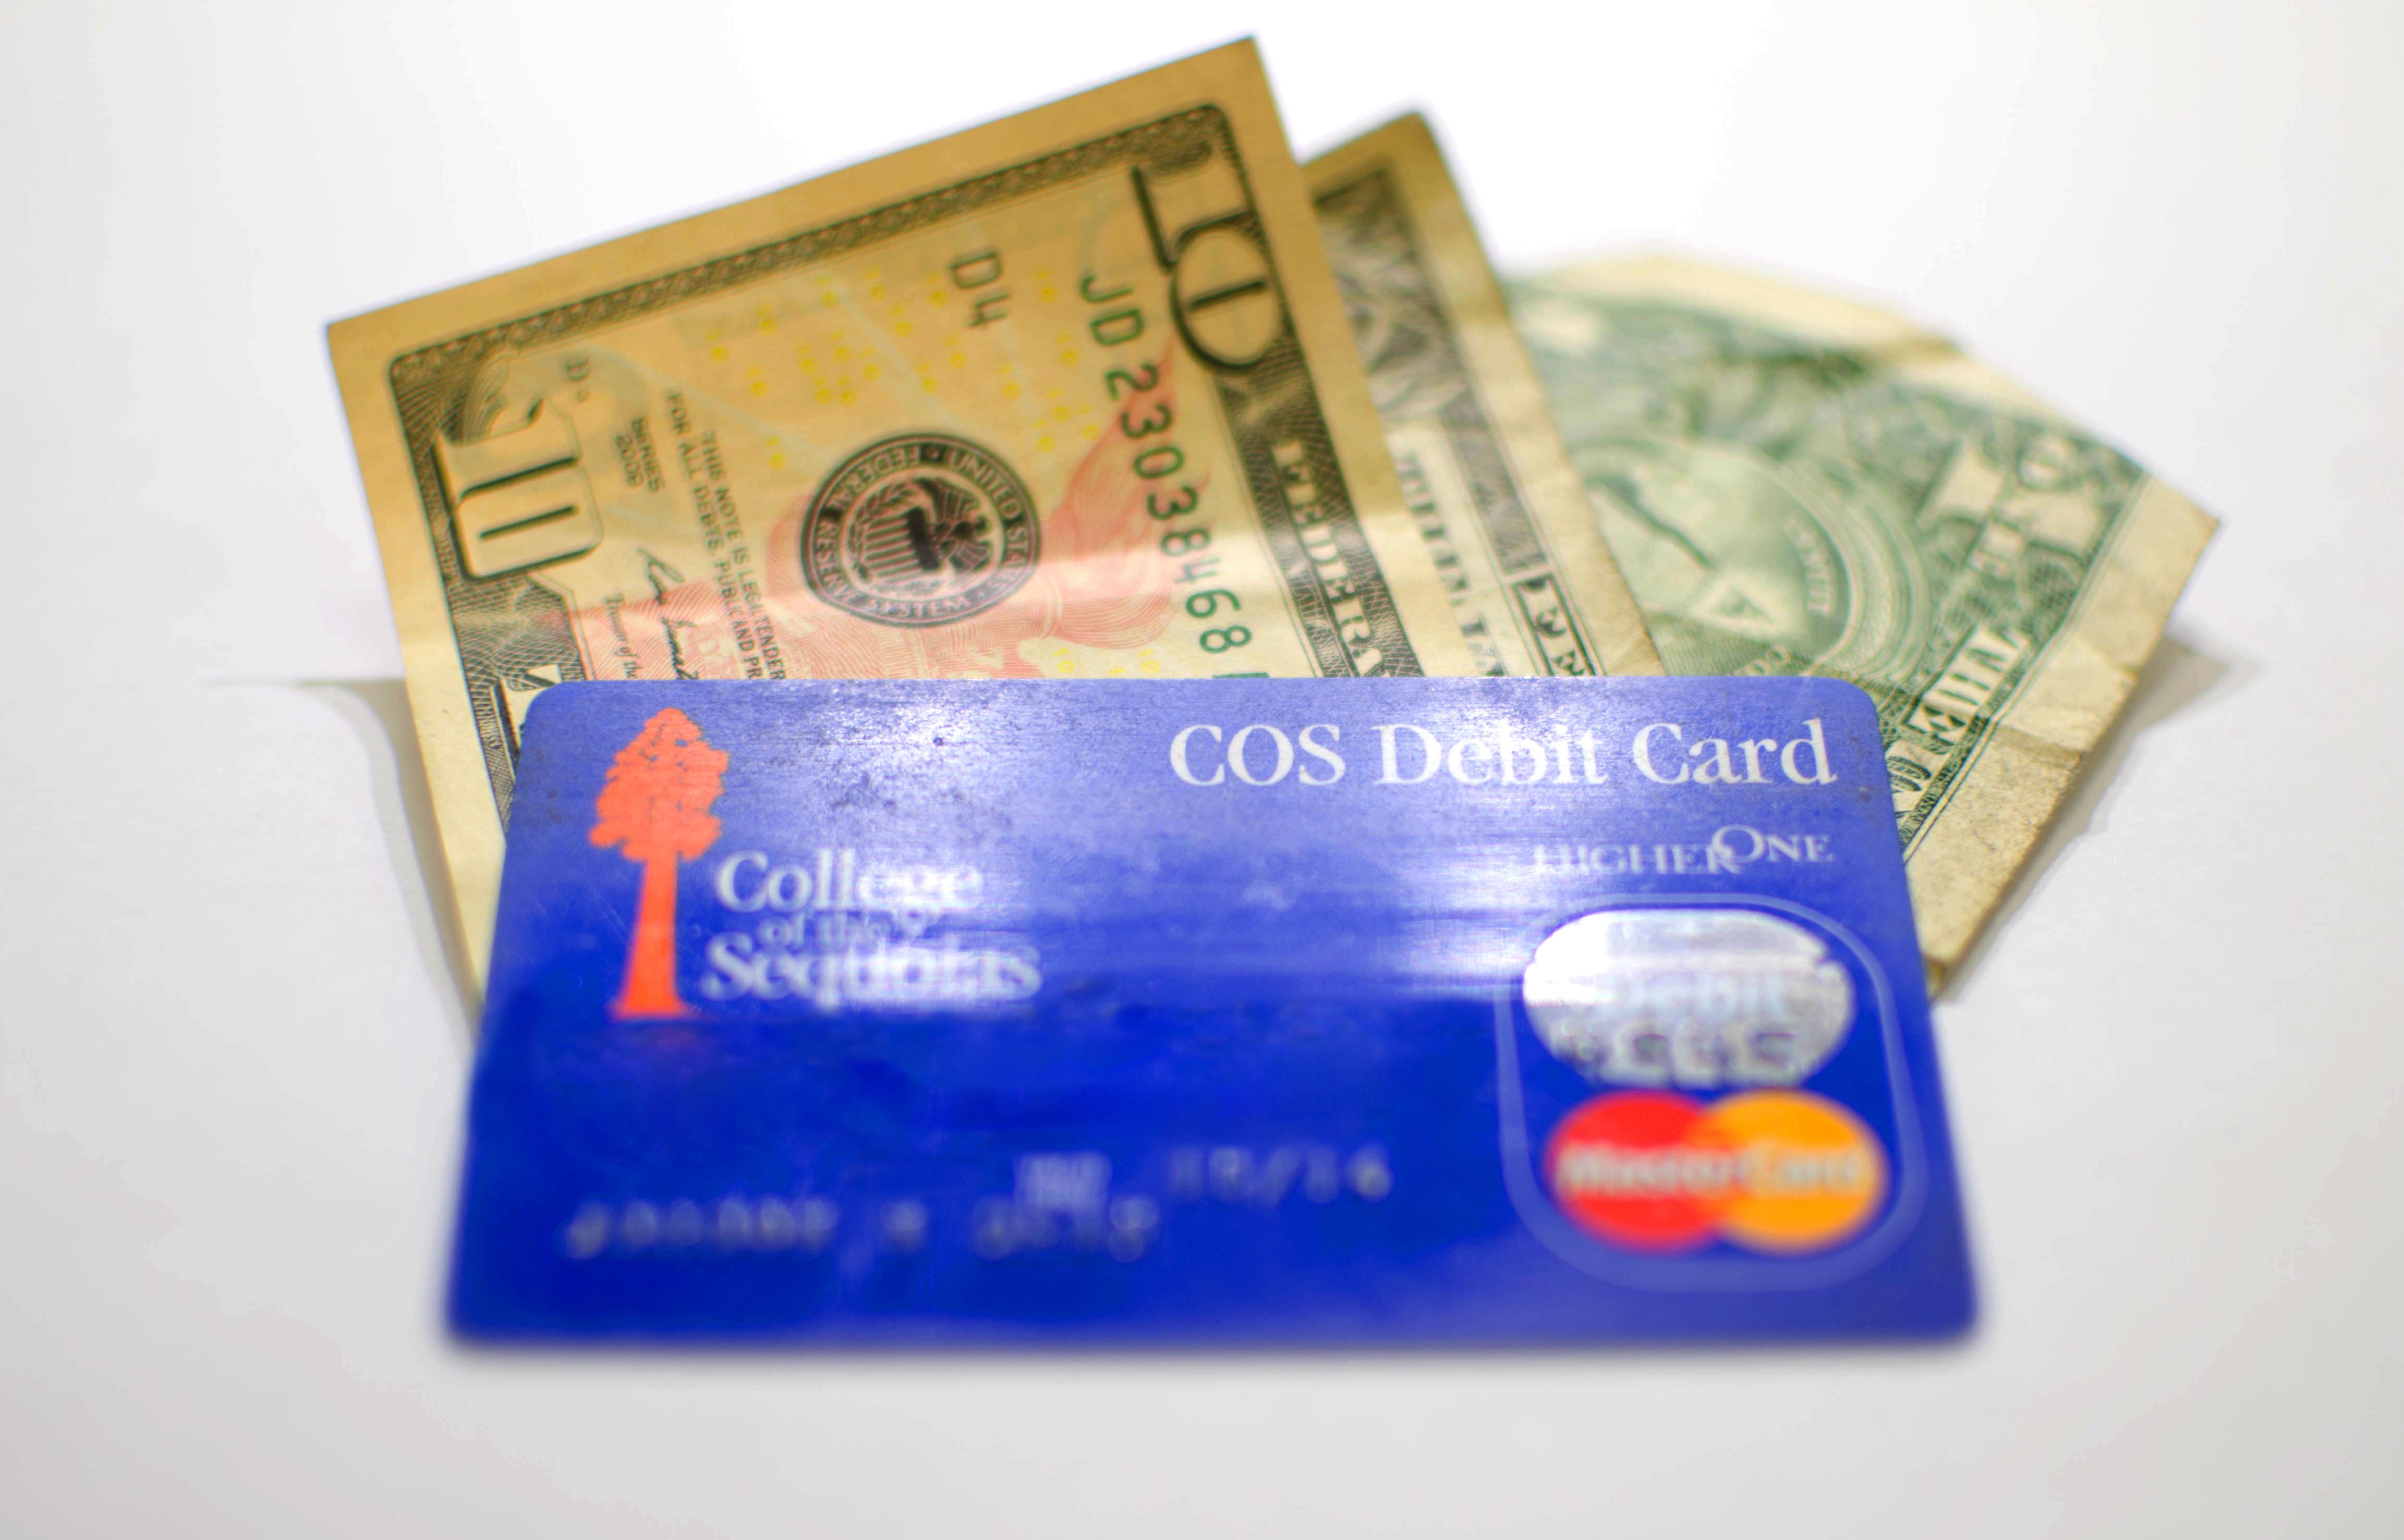 The Most Complete Randomness: Cash or Debit?